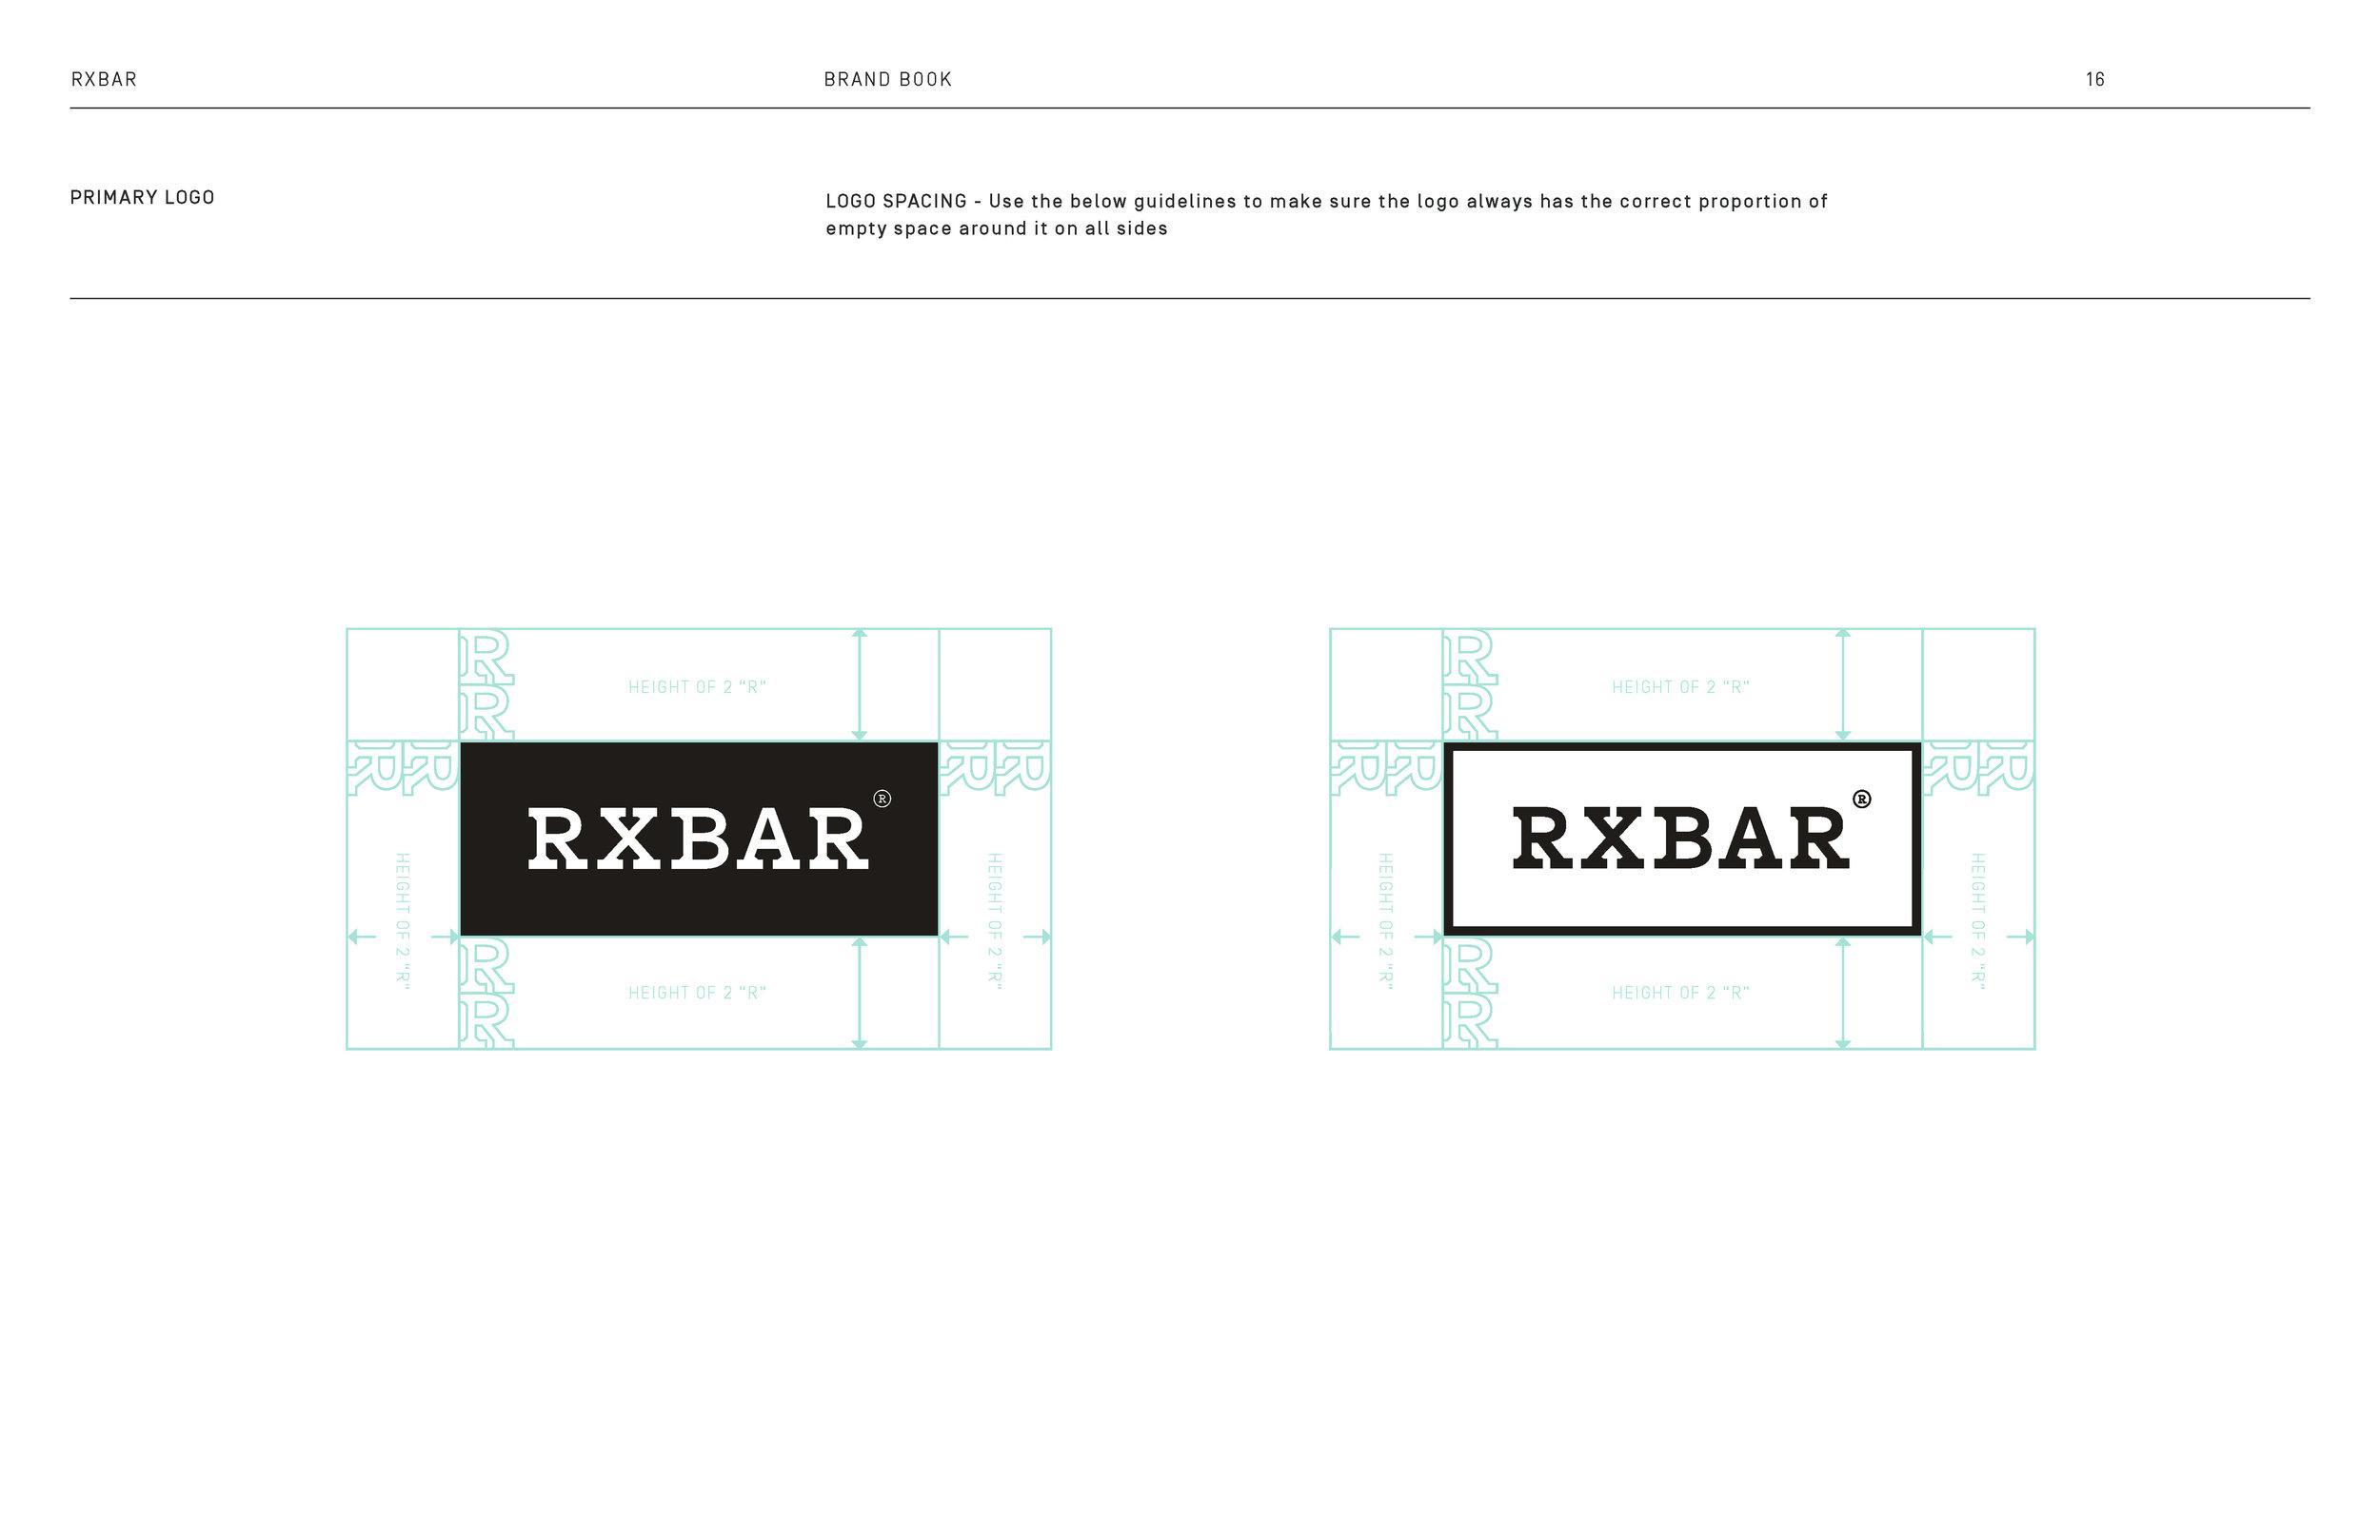 RXBAR_Brand guide_mwf_Page_16.jpg